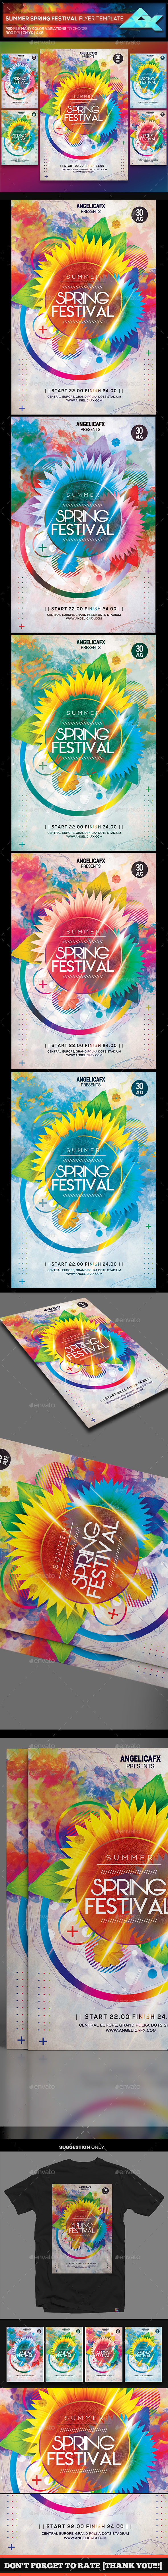 Summer Spring Festival Flyer Template - Flyers Print Templates